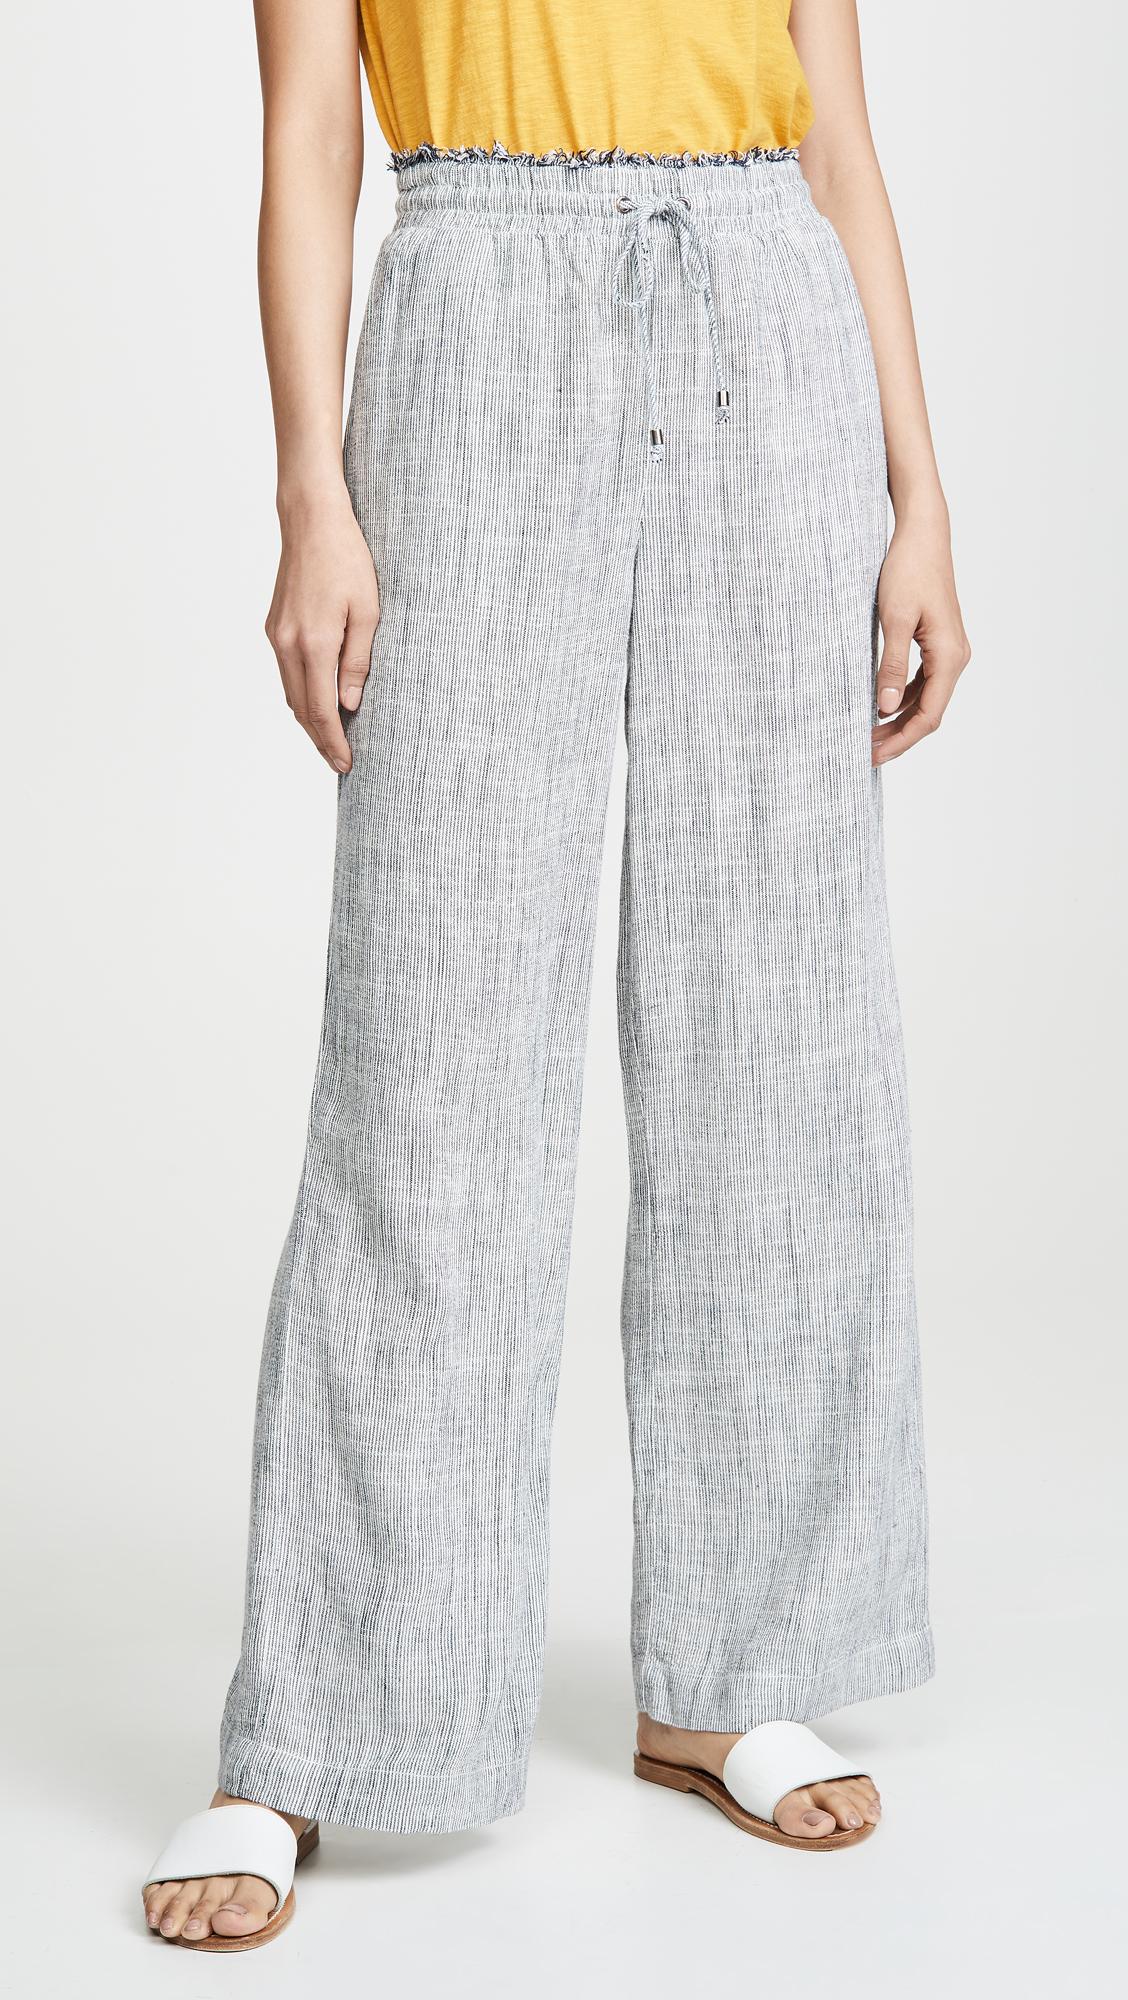 Splendid Railroad Stripe Pants